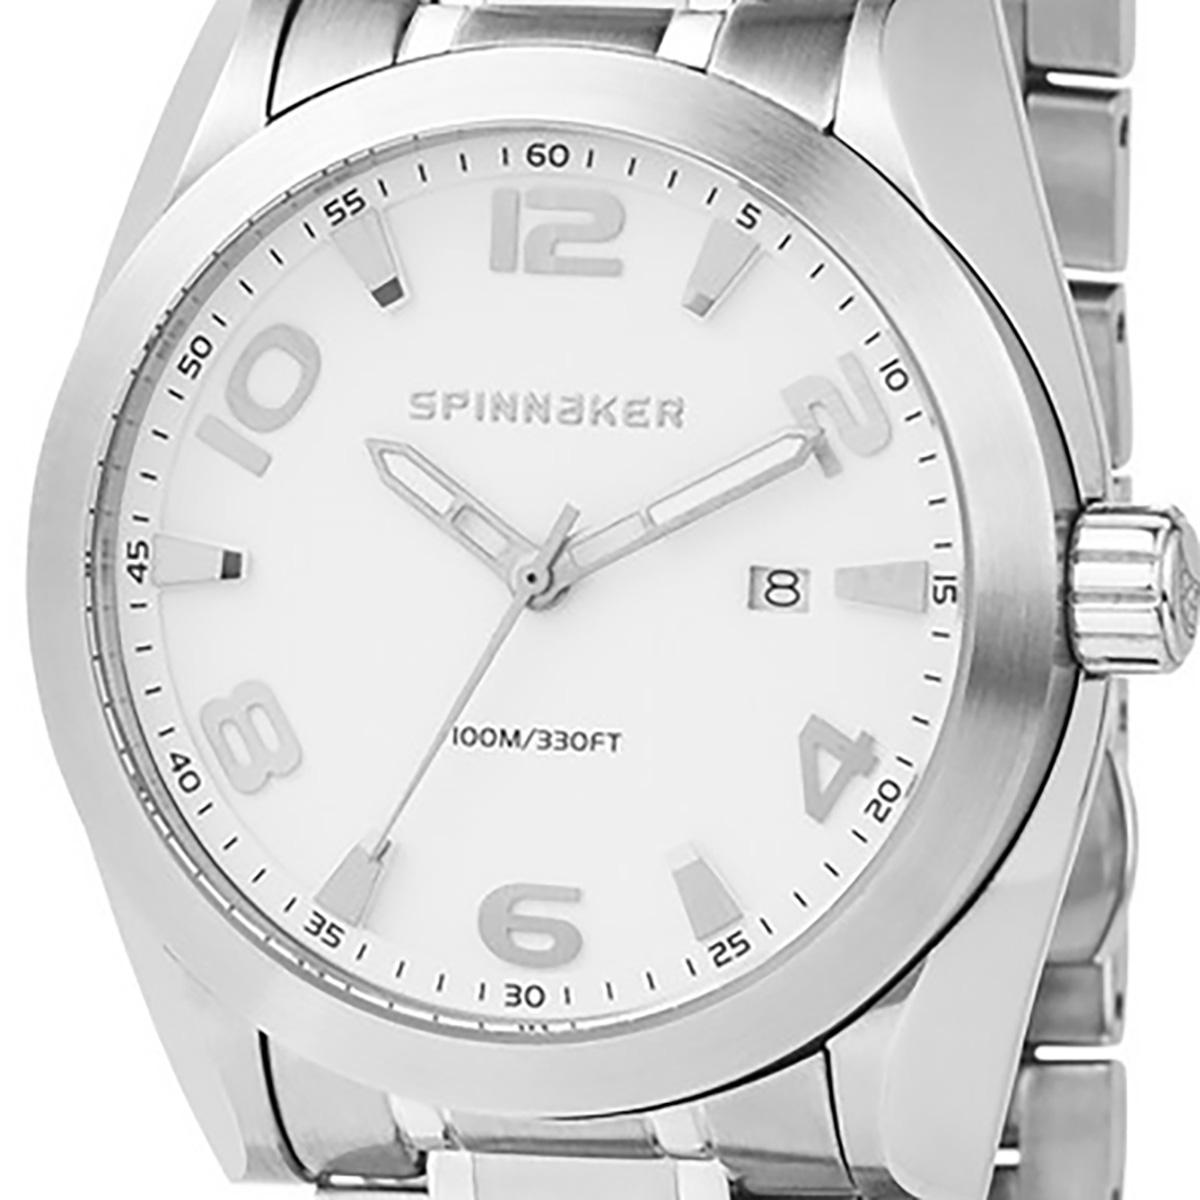 SPINNAKER スピネーカー 電池式クォーツ 腕時計 [SP-5045-33] 並行輸入品  デイト